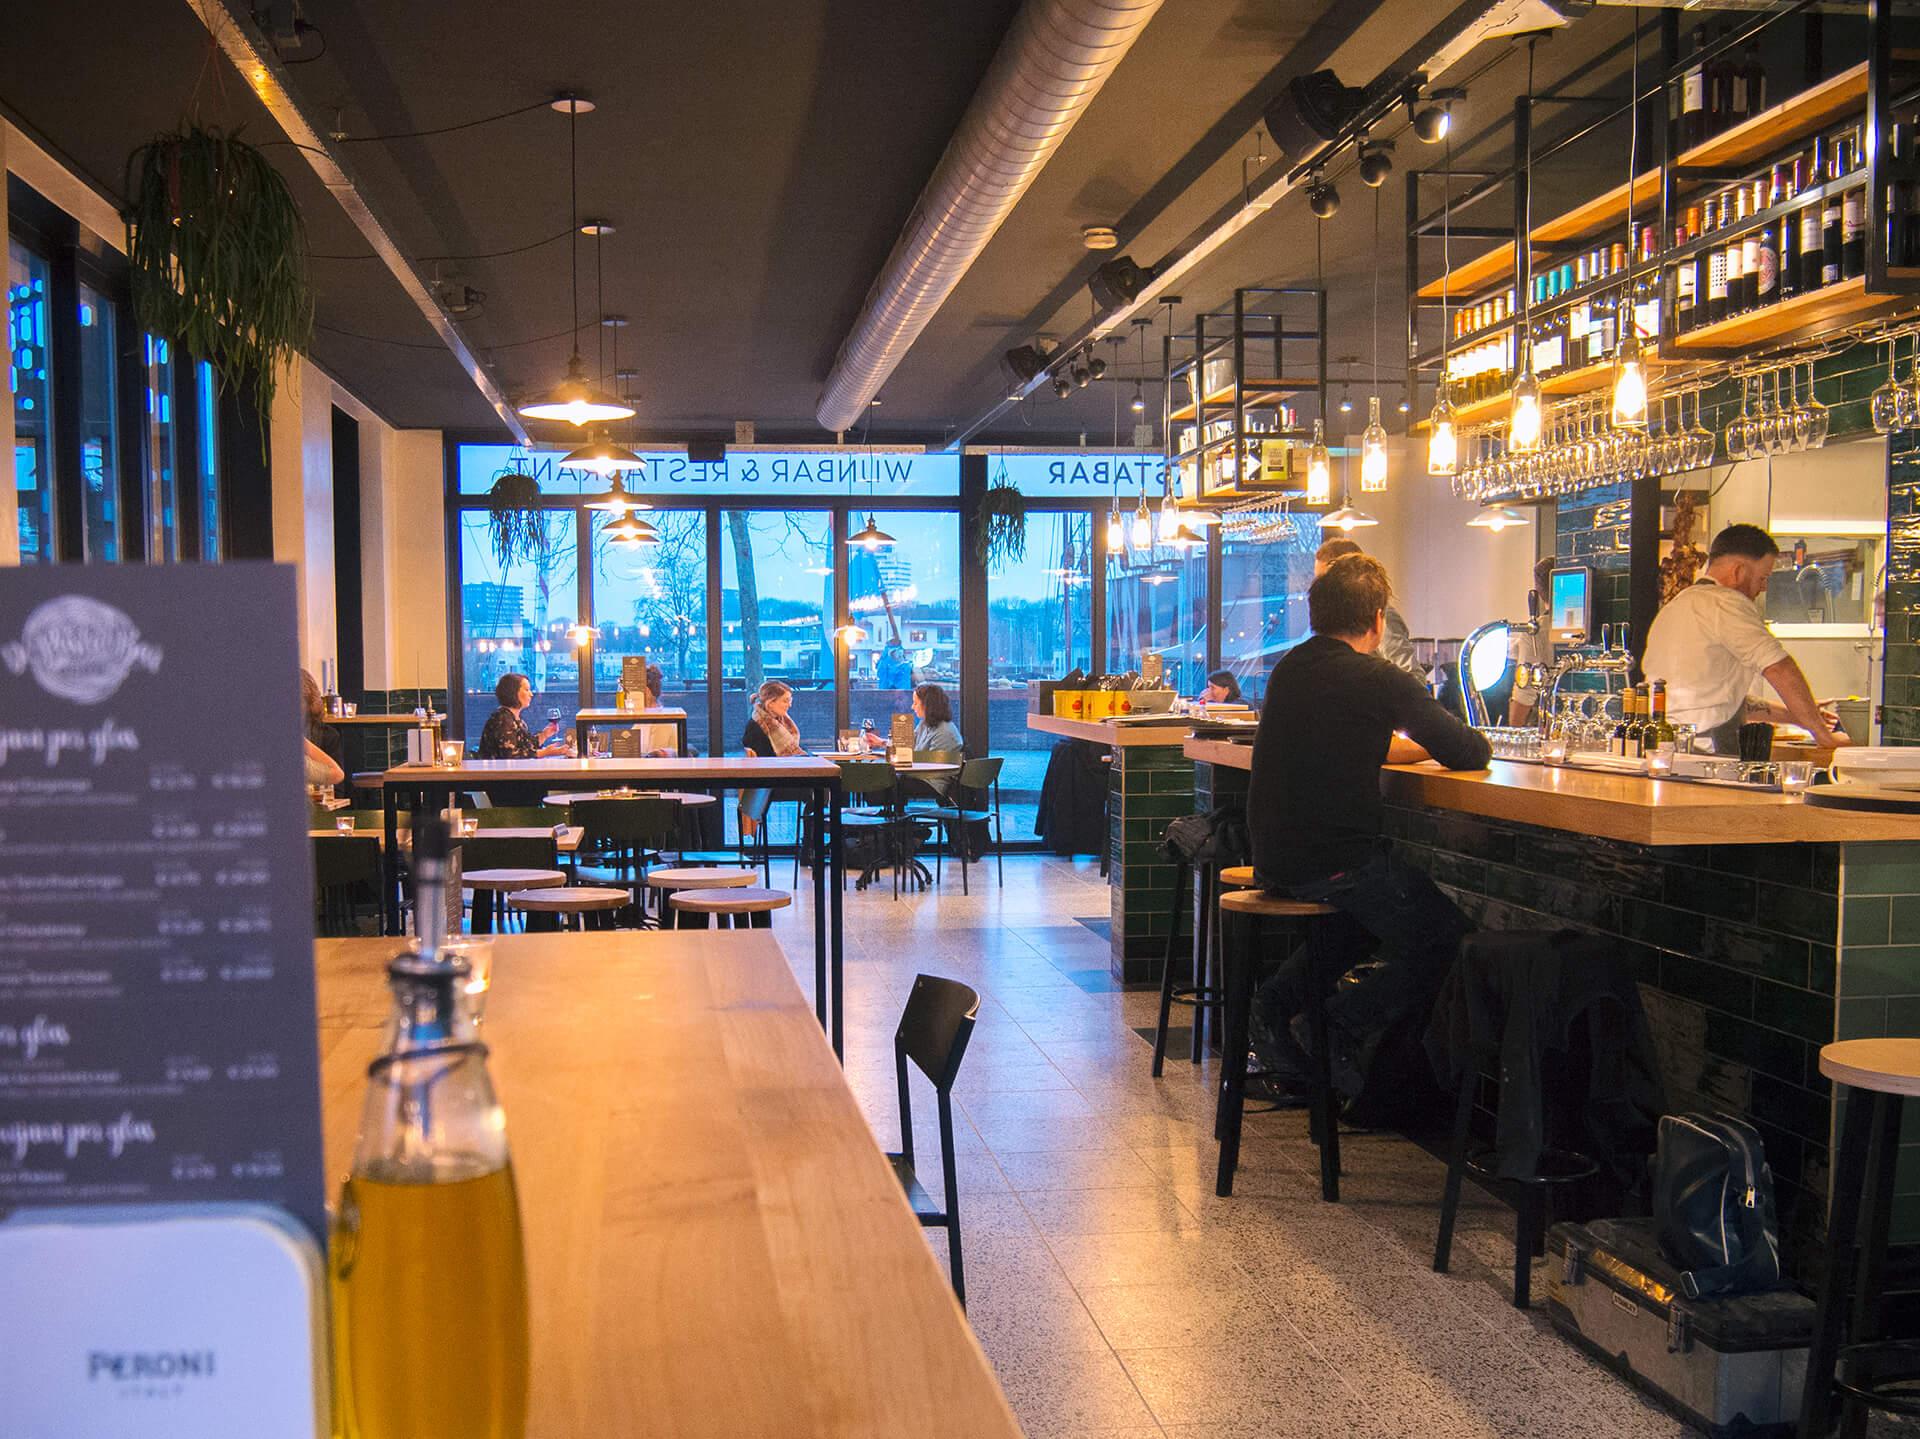 de pastabar utrecht interieur ontwerp bar restaurant tubbs design interior web. Black Bedroom Furniture Sets. Home Design Ideas